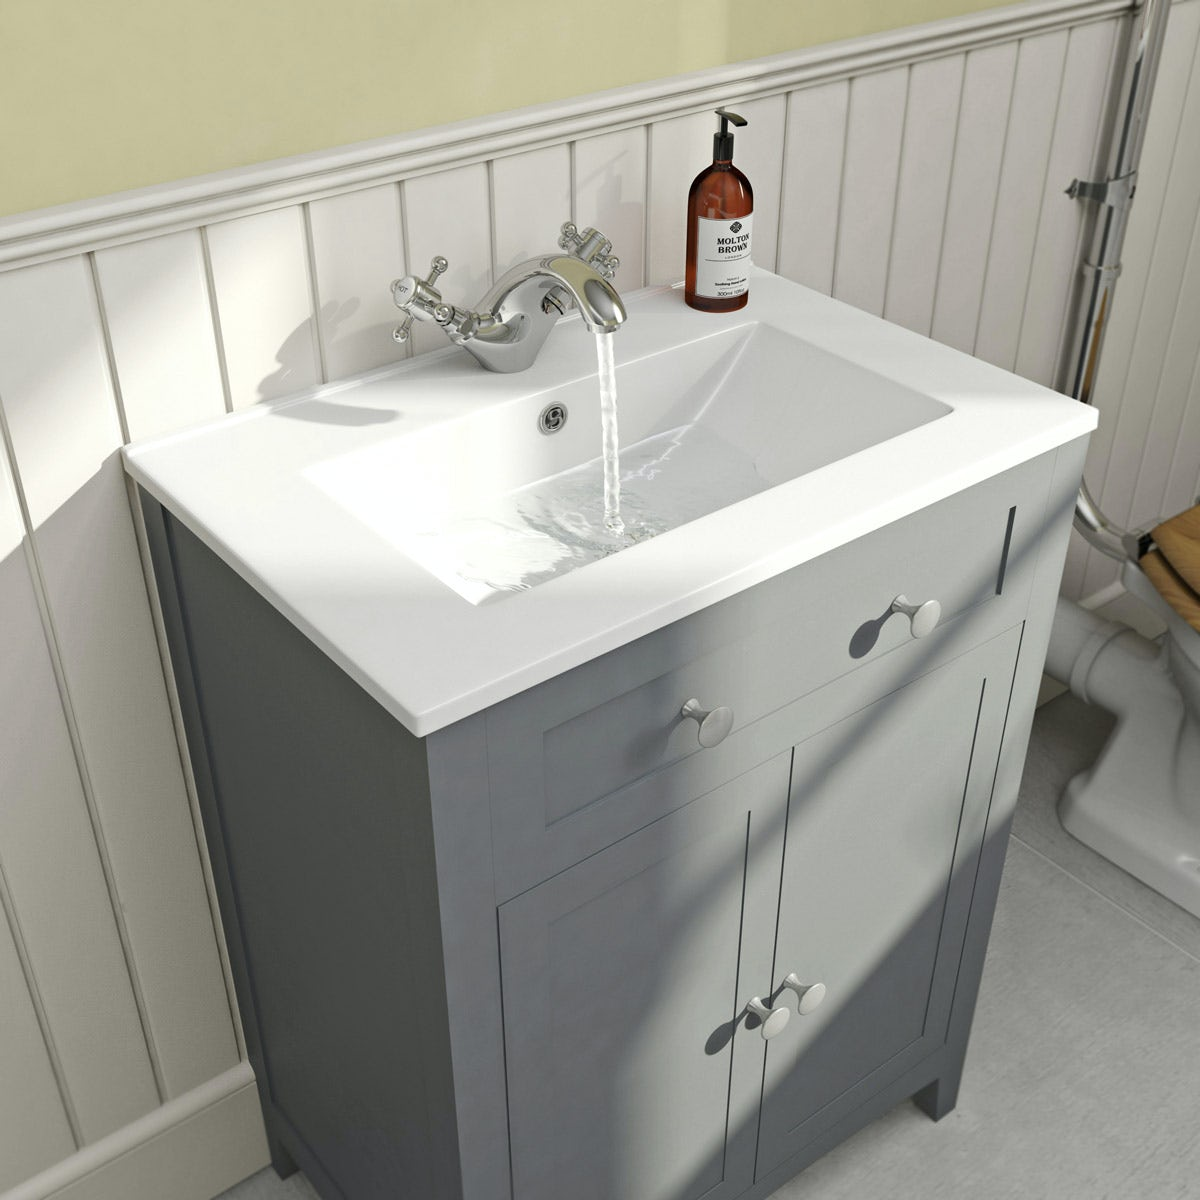 The Bath Co  Camberley satin grey vanity unit with basin 600mmBath Co  Camberley satin grey vanity unit with basin 600mm. Vanity Sink Units For Bathrooms. Home Design Ideas